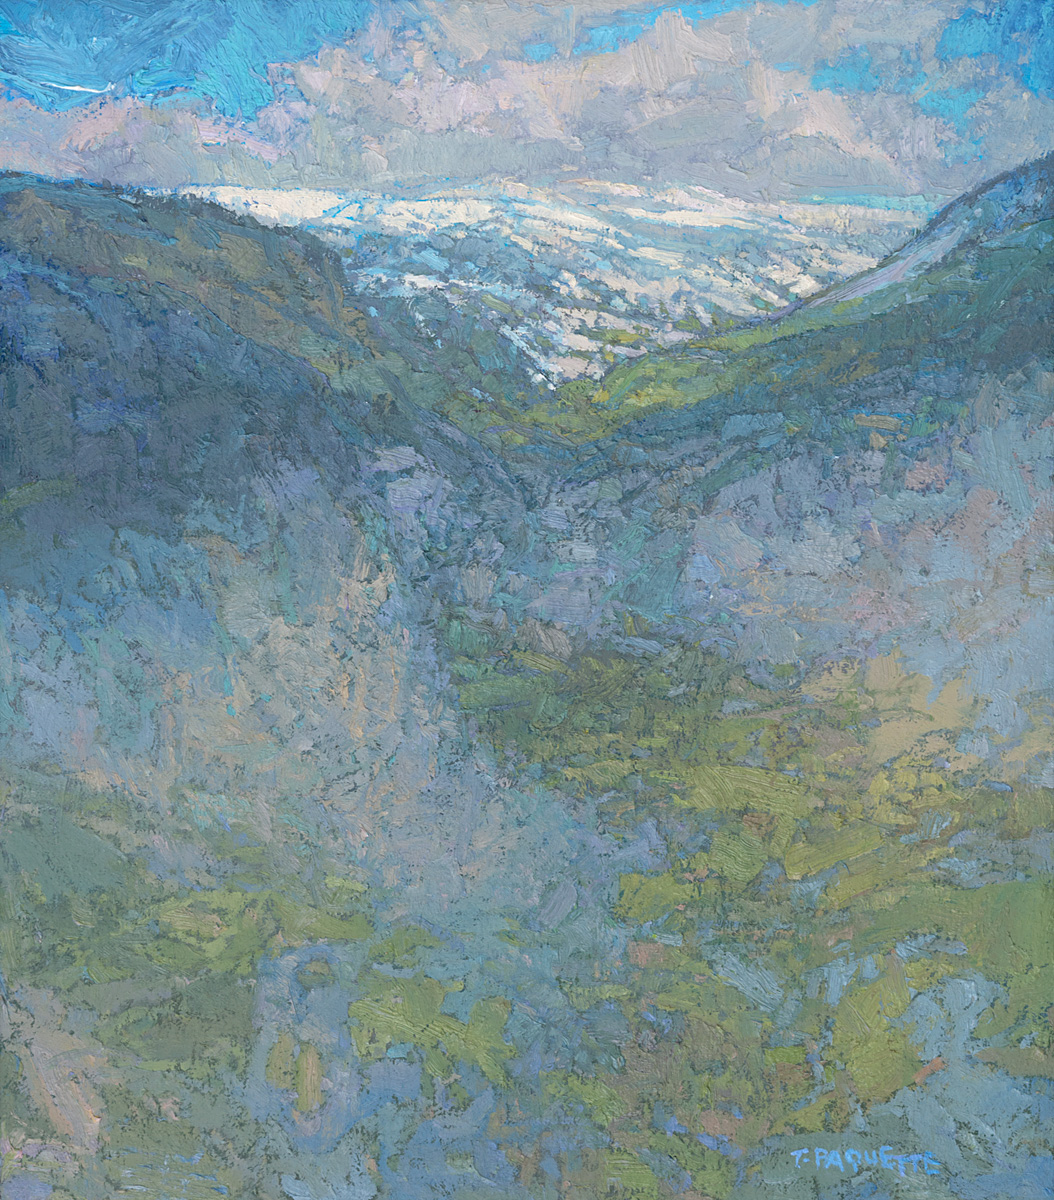 contemporary landscape oil painting near Colmars-les-Alpes, France